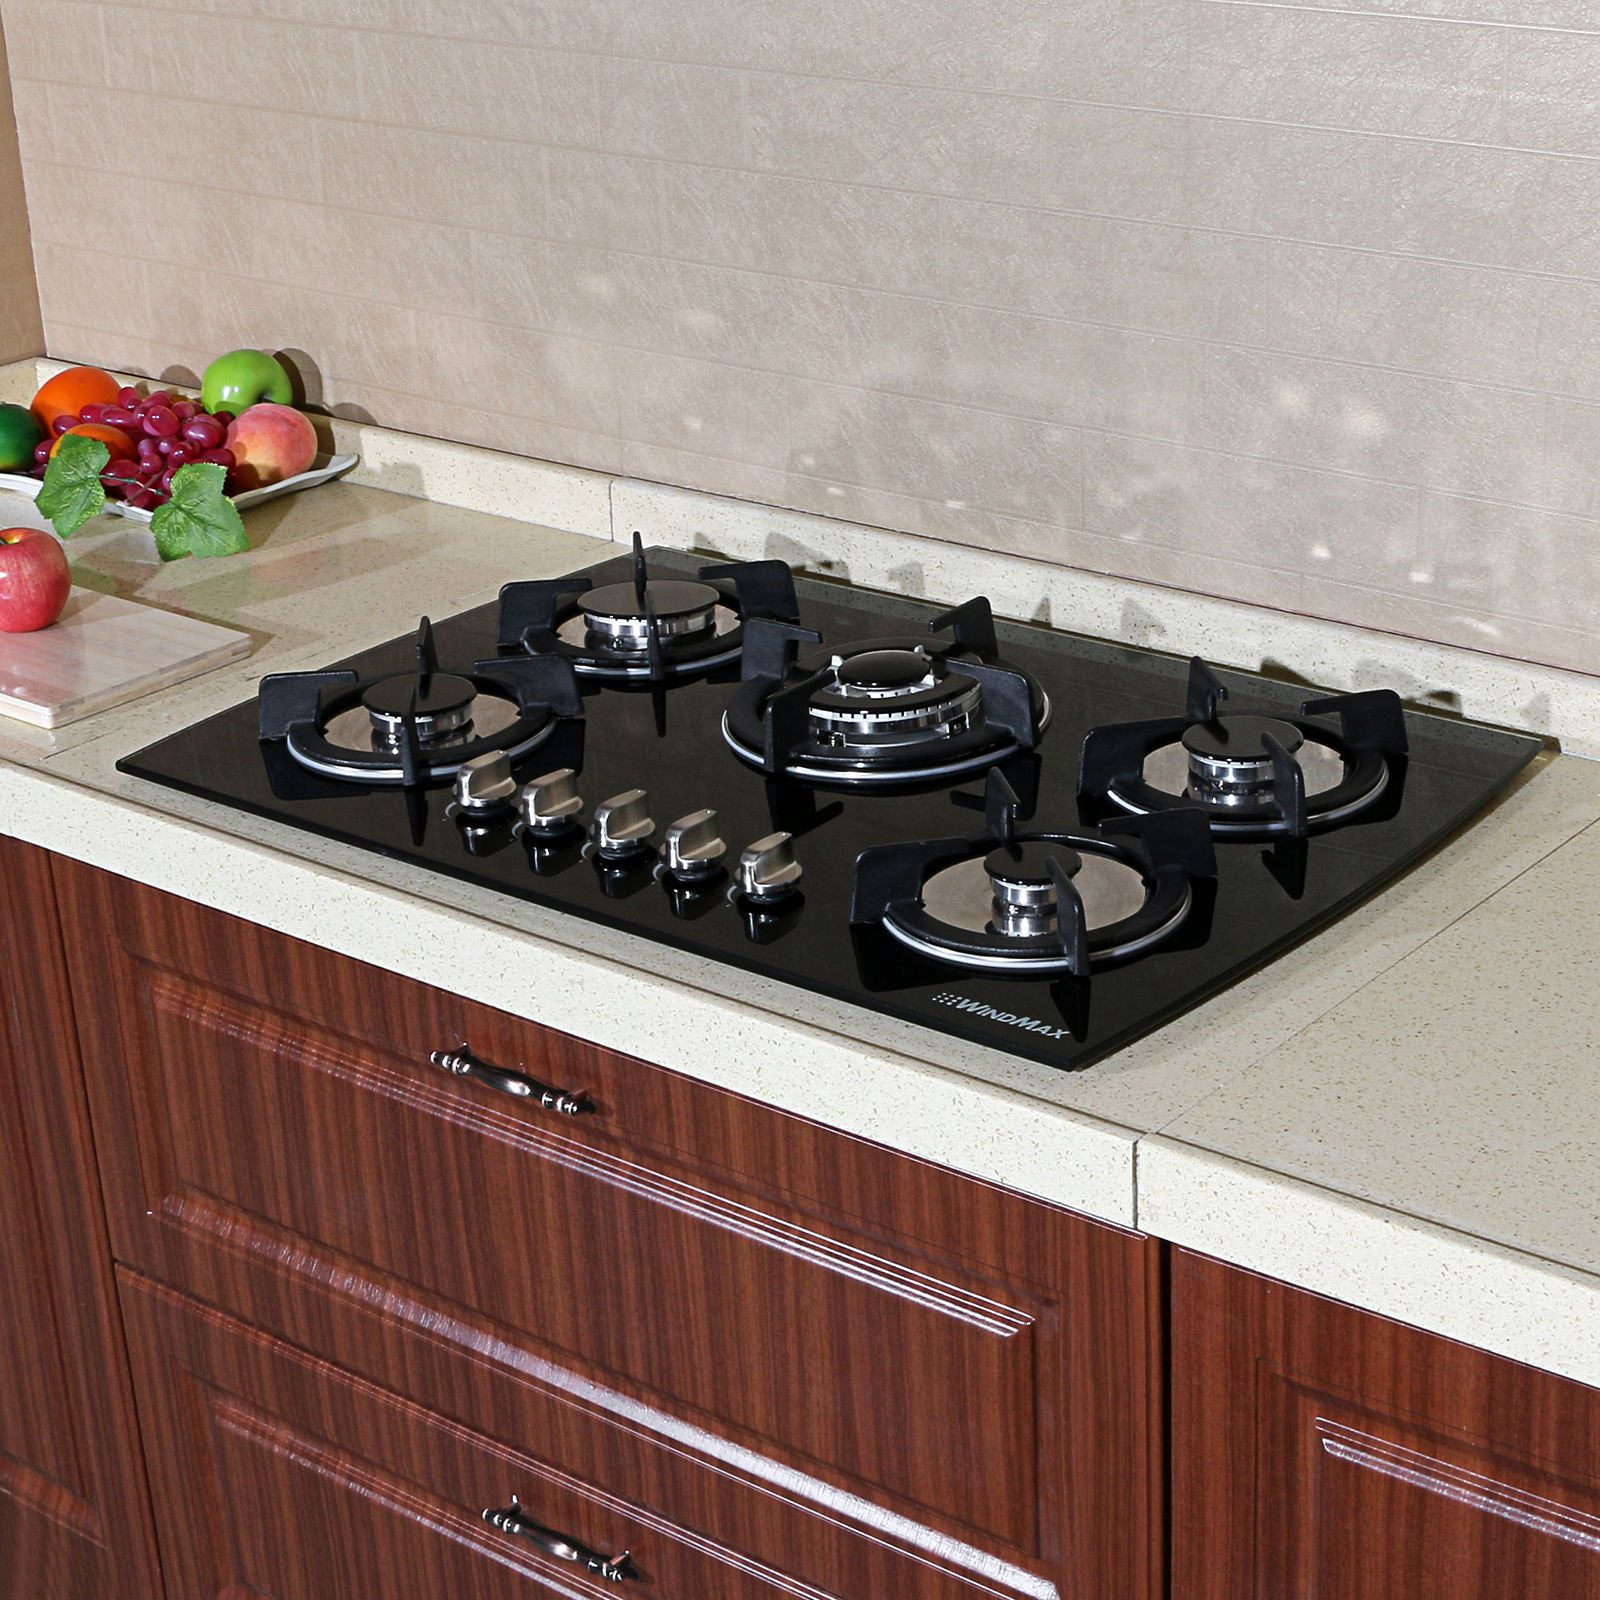 stove lehman progress lane reno countertop kitchen countertops electric new our